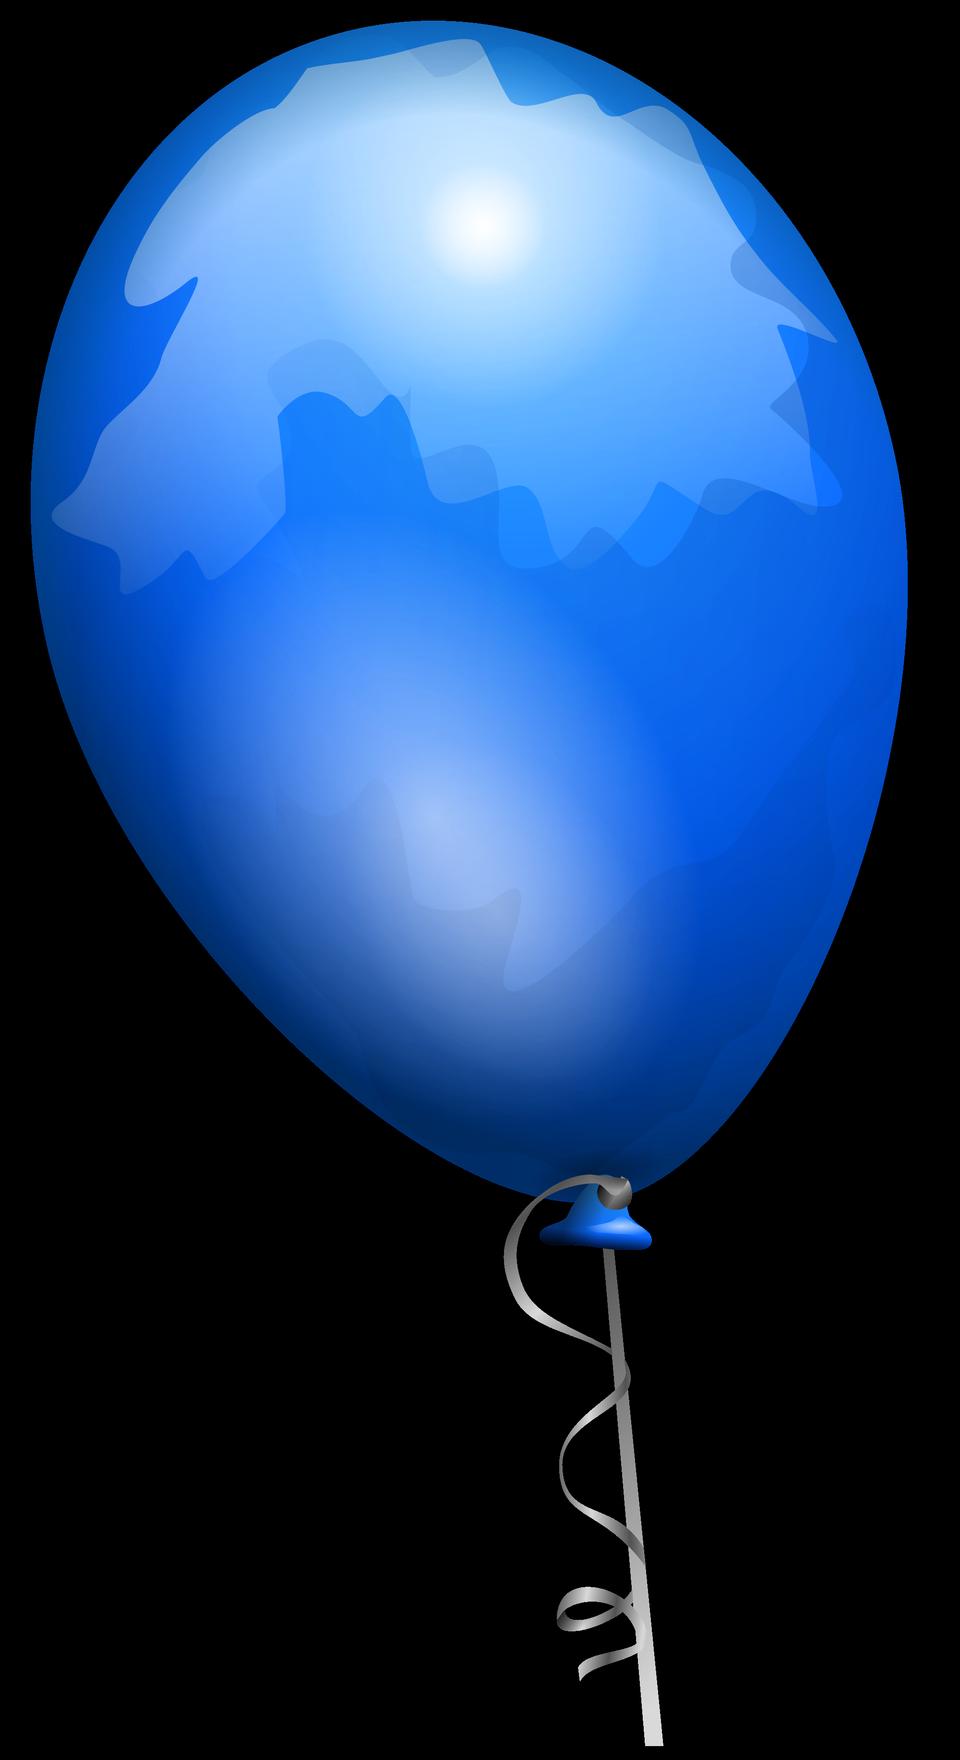 Blue toy balloon